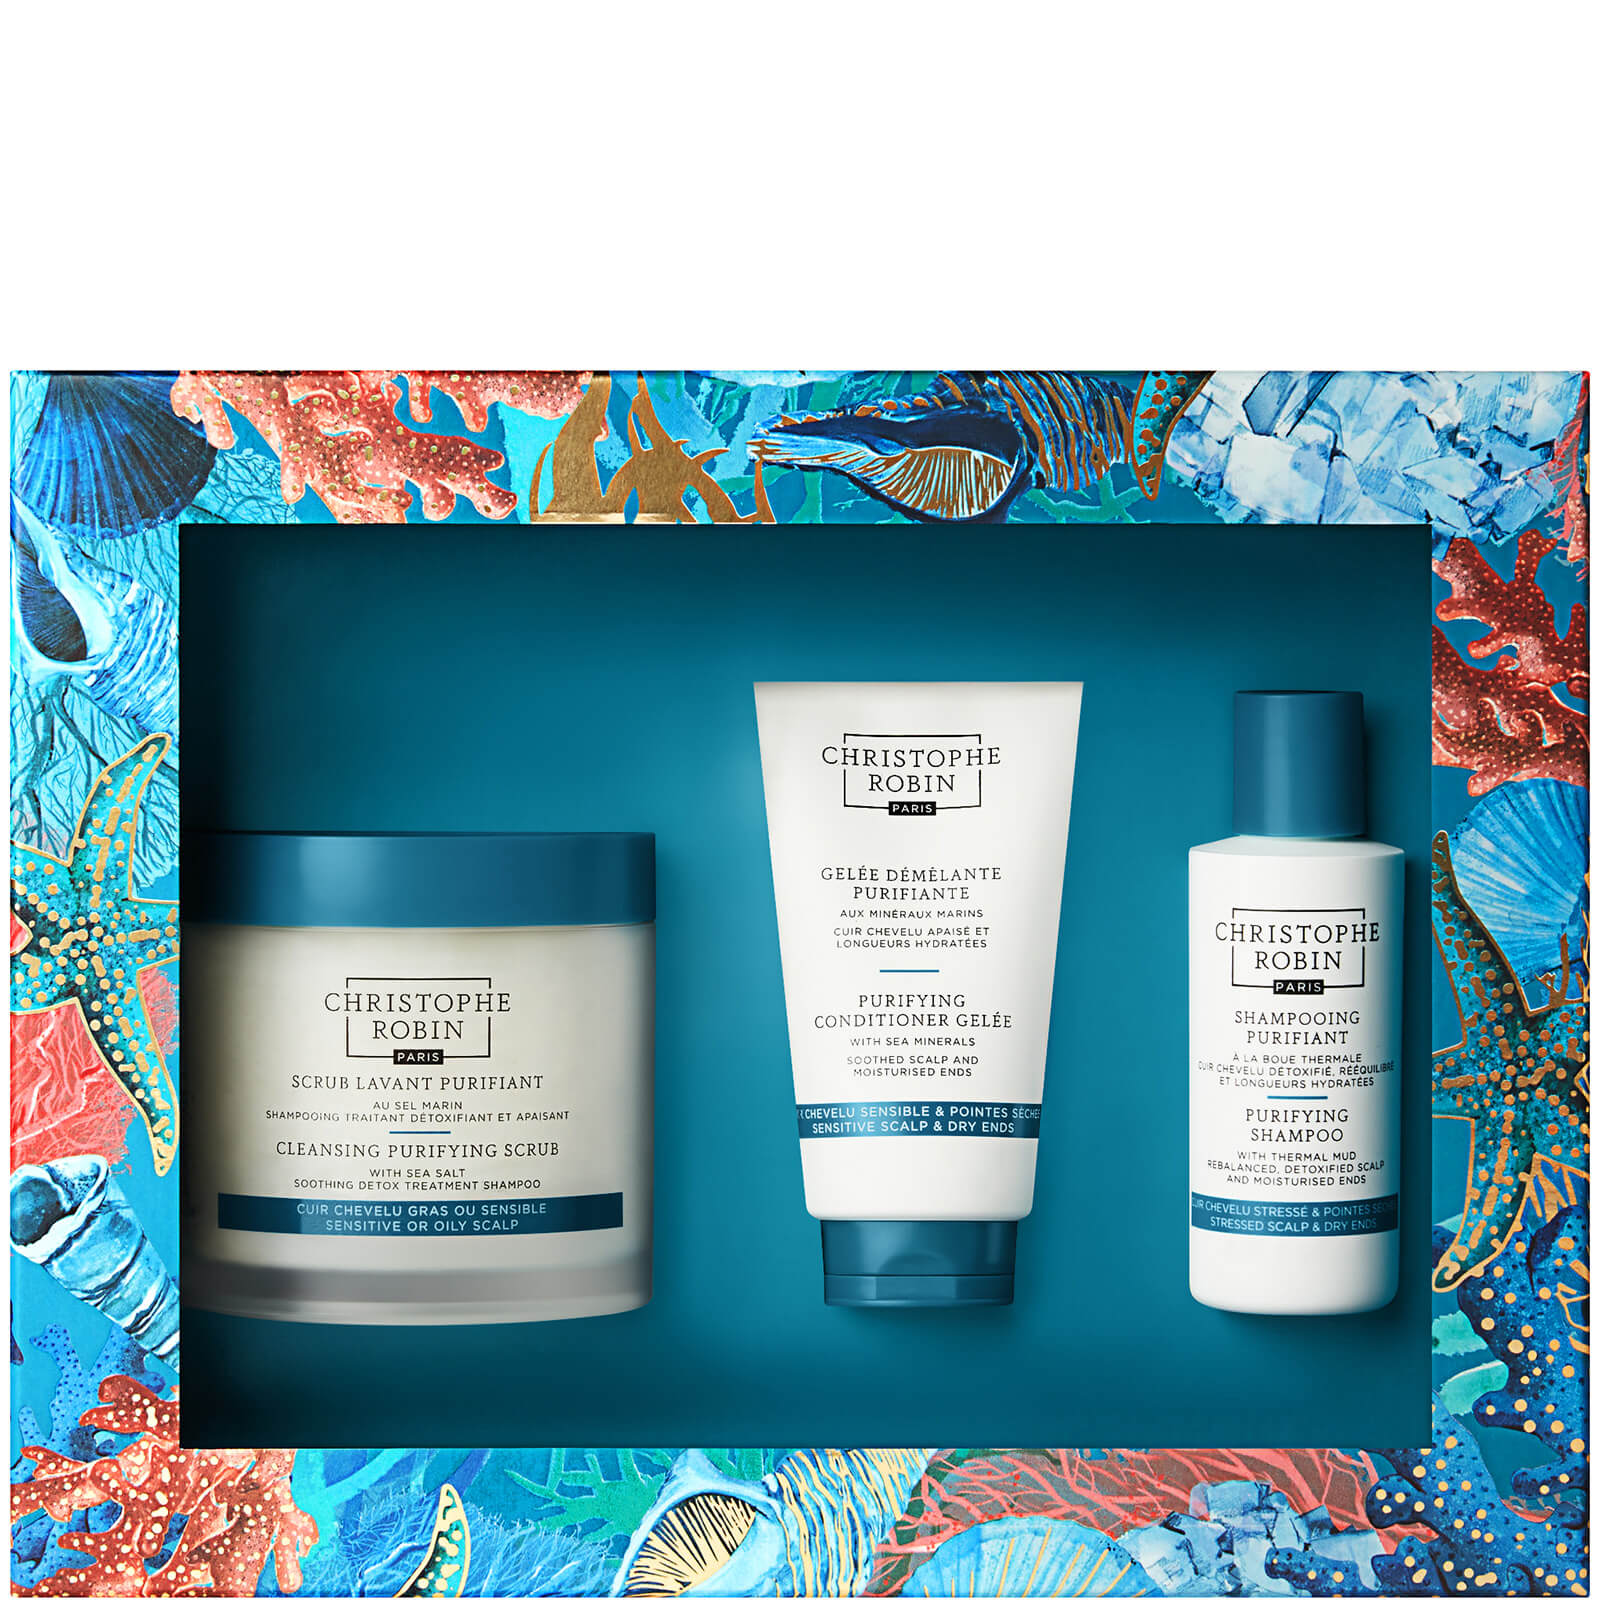 Купить Christophe Robin New Detox Ritual Gift Set